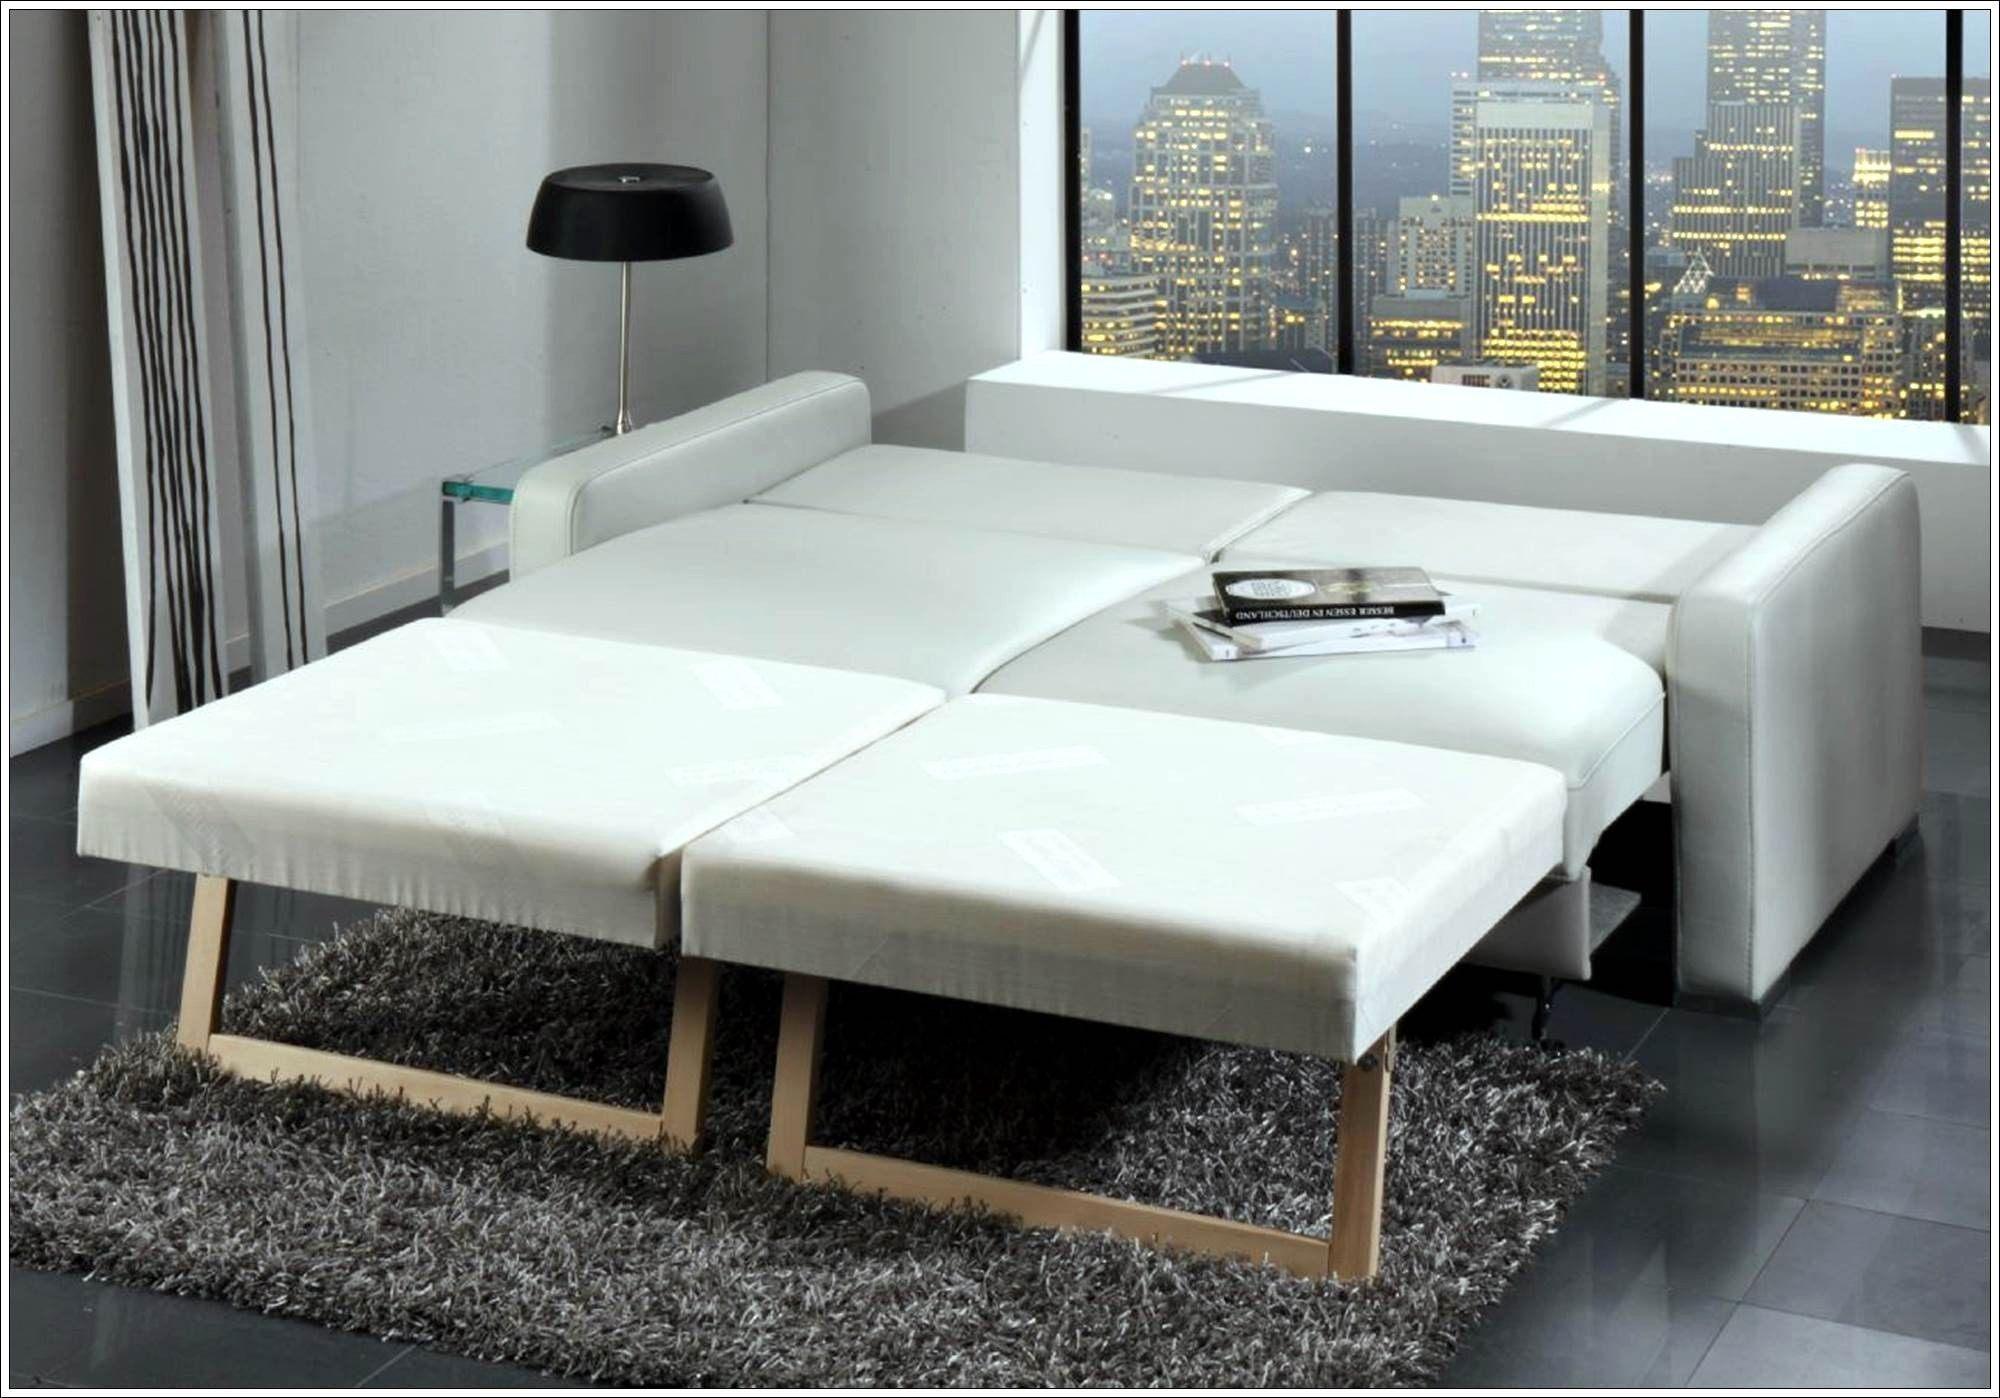 Lit Superposé Avec Bureau De Luxe Incroyable Lit Canapé Escamotable Ou Lit Bureau Escamotable Lit